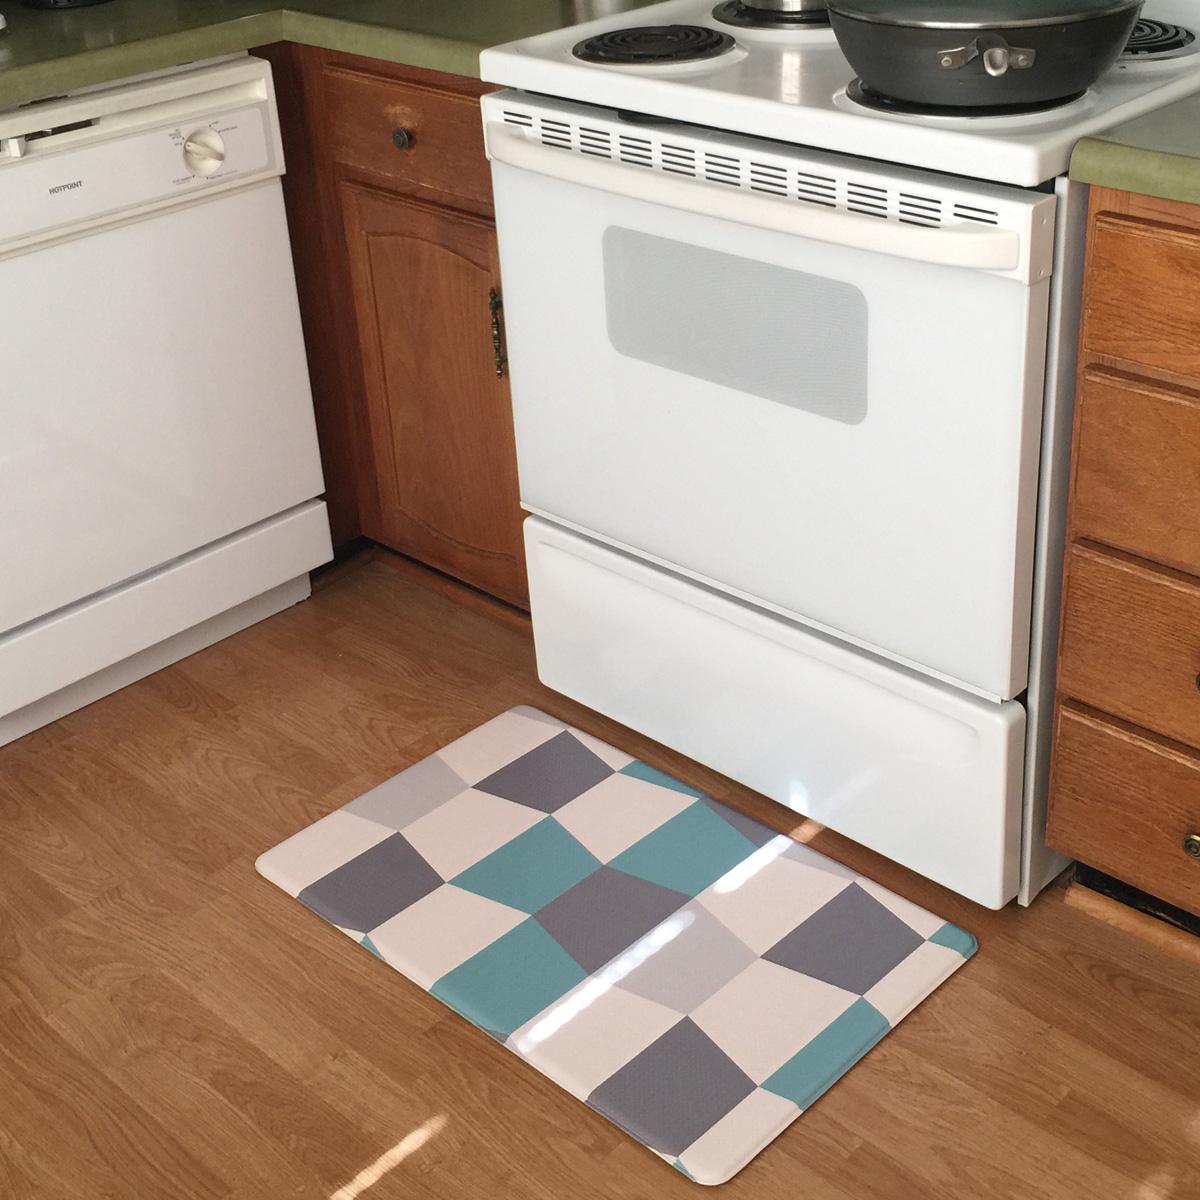 Anti Slip Anti Fatigue Memory Form Kitchen Comfort Mat 18 X 30